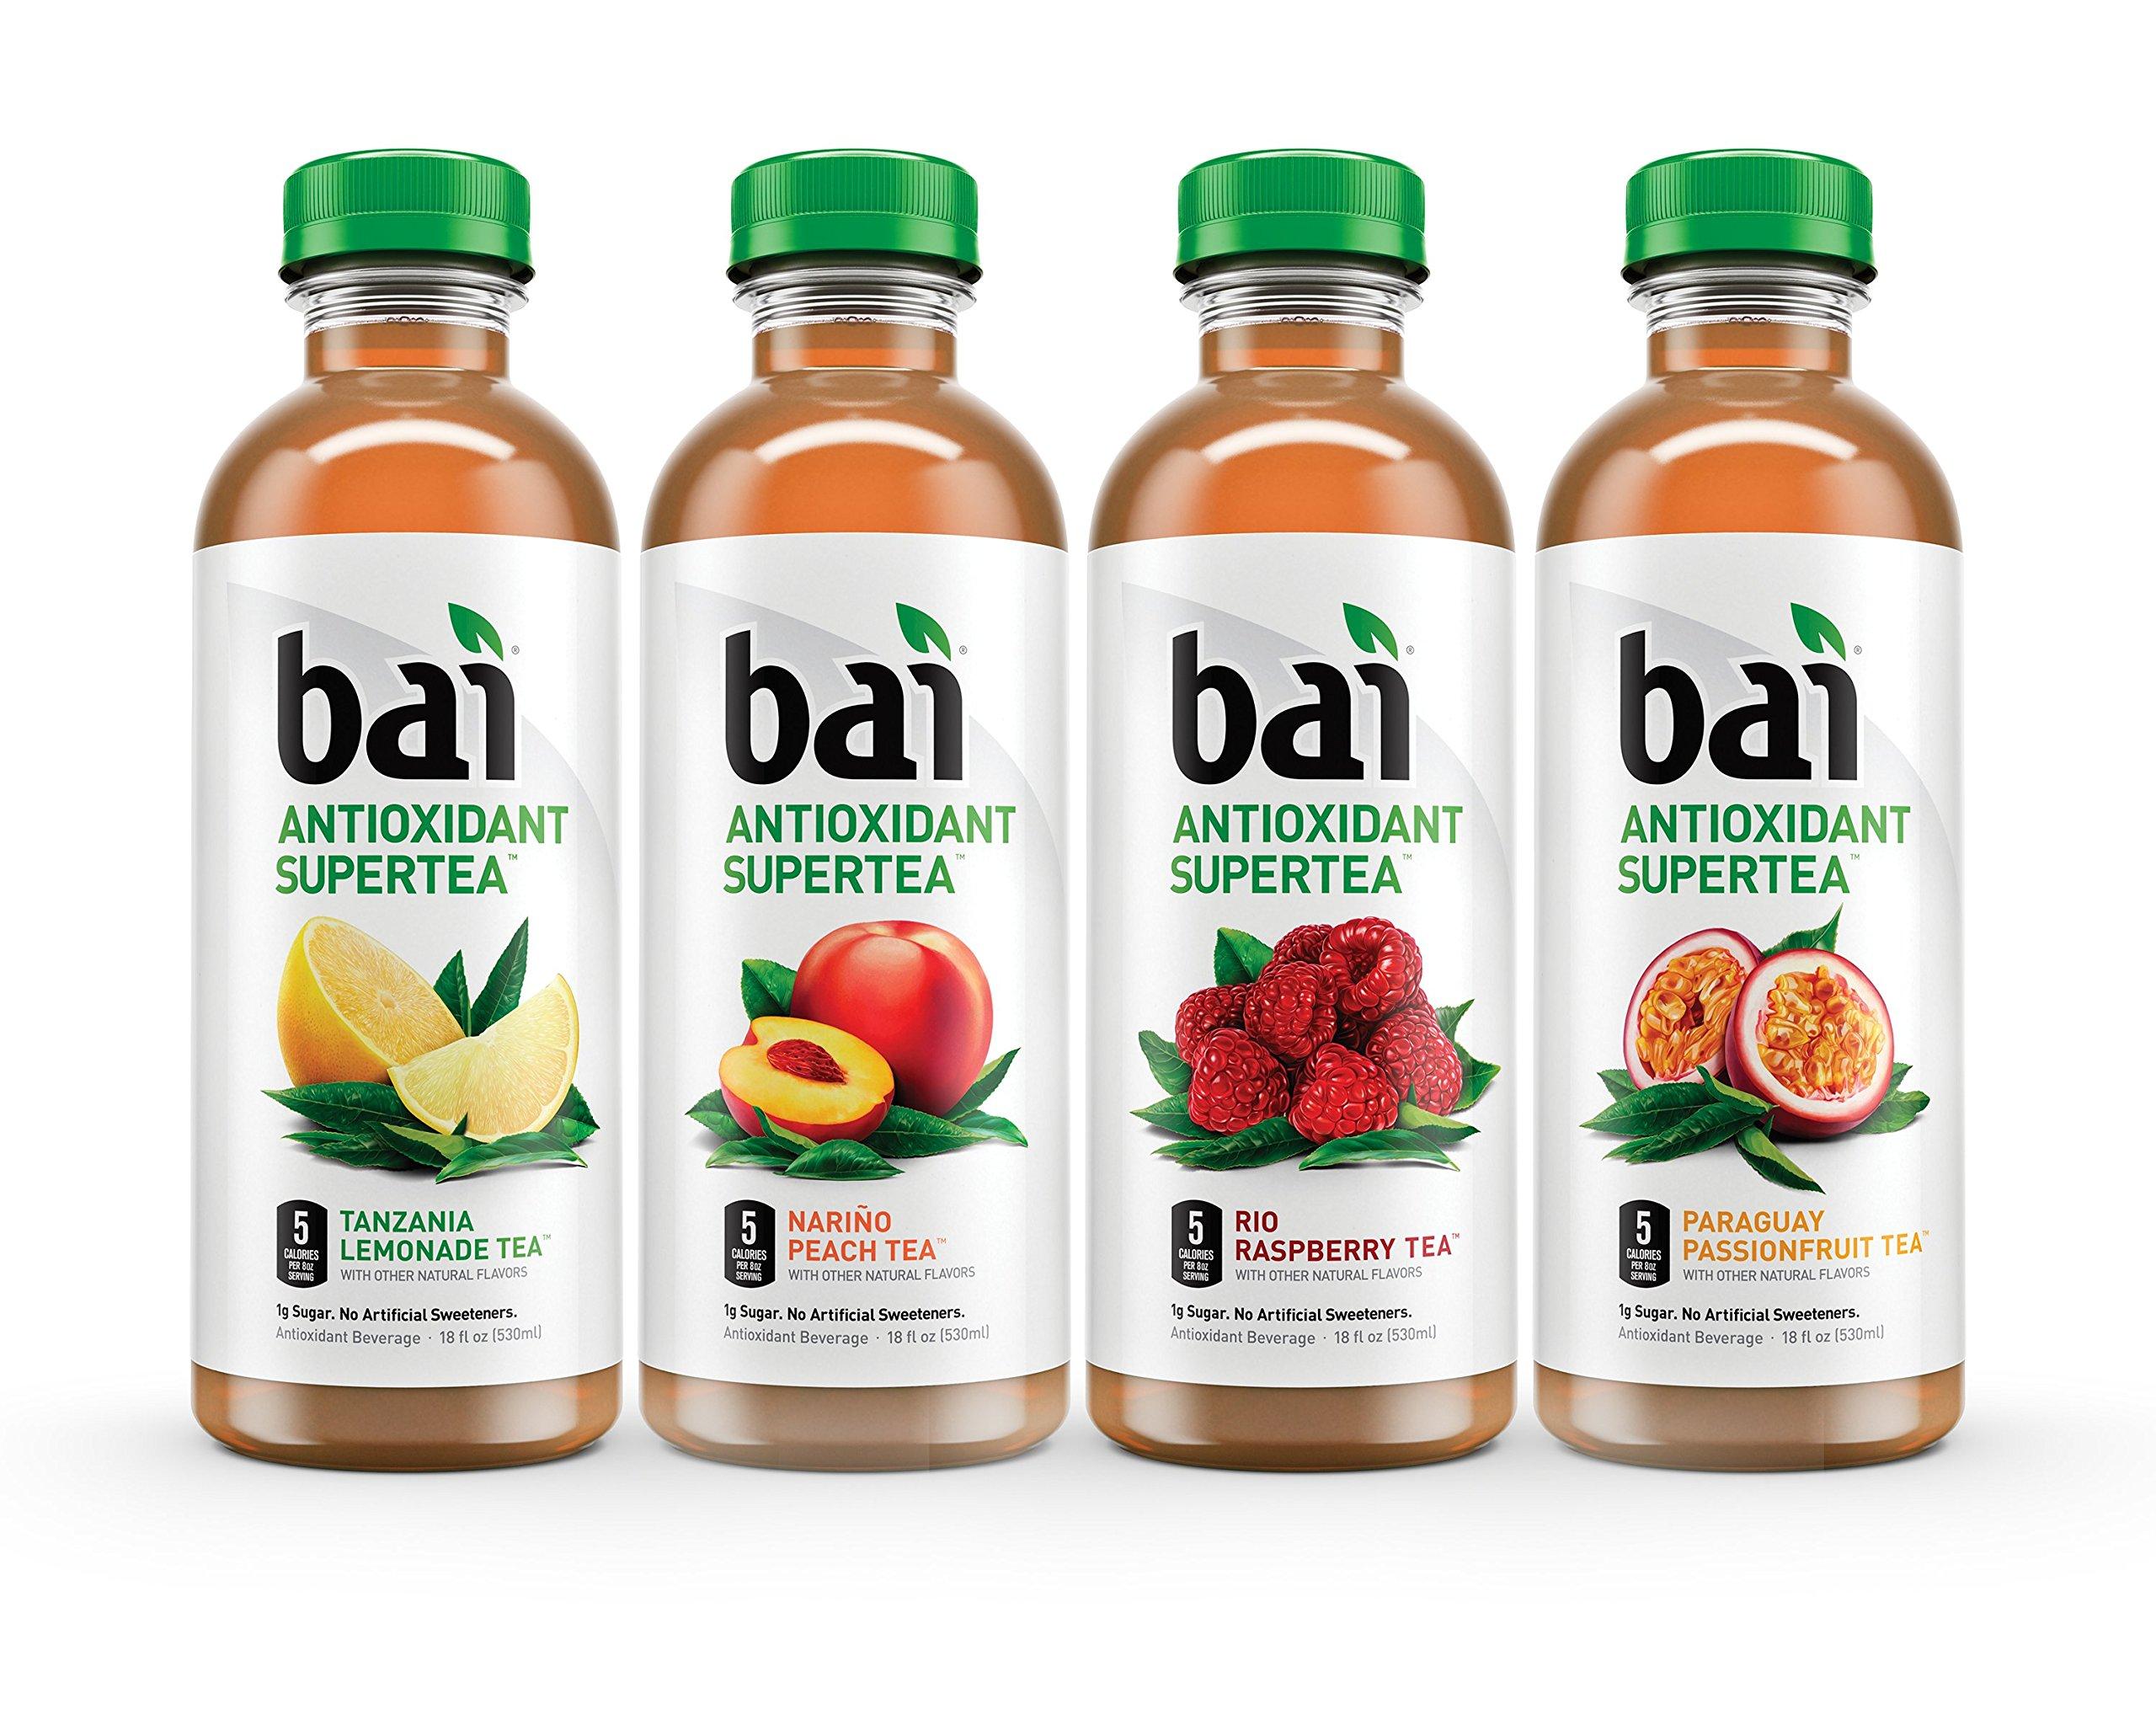 Bai Supertea Variety Pack, Antioxidant Infused Supertea, 18 Fluid Ounce Bottles, 12 count, (3 bottles each of Tanzania Lemonade Tea, Paraguay Passionfruit Tea, Rio Raspberry Tea, Narino Peach Tea)